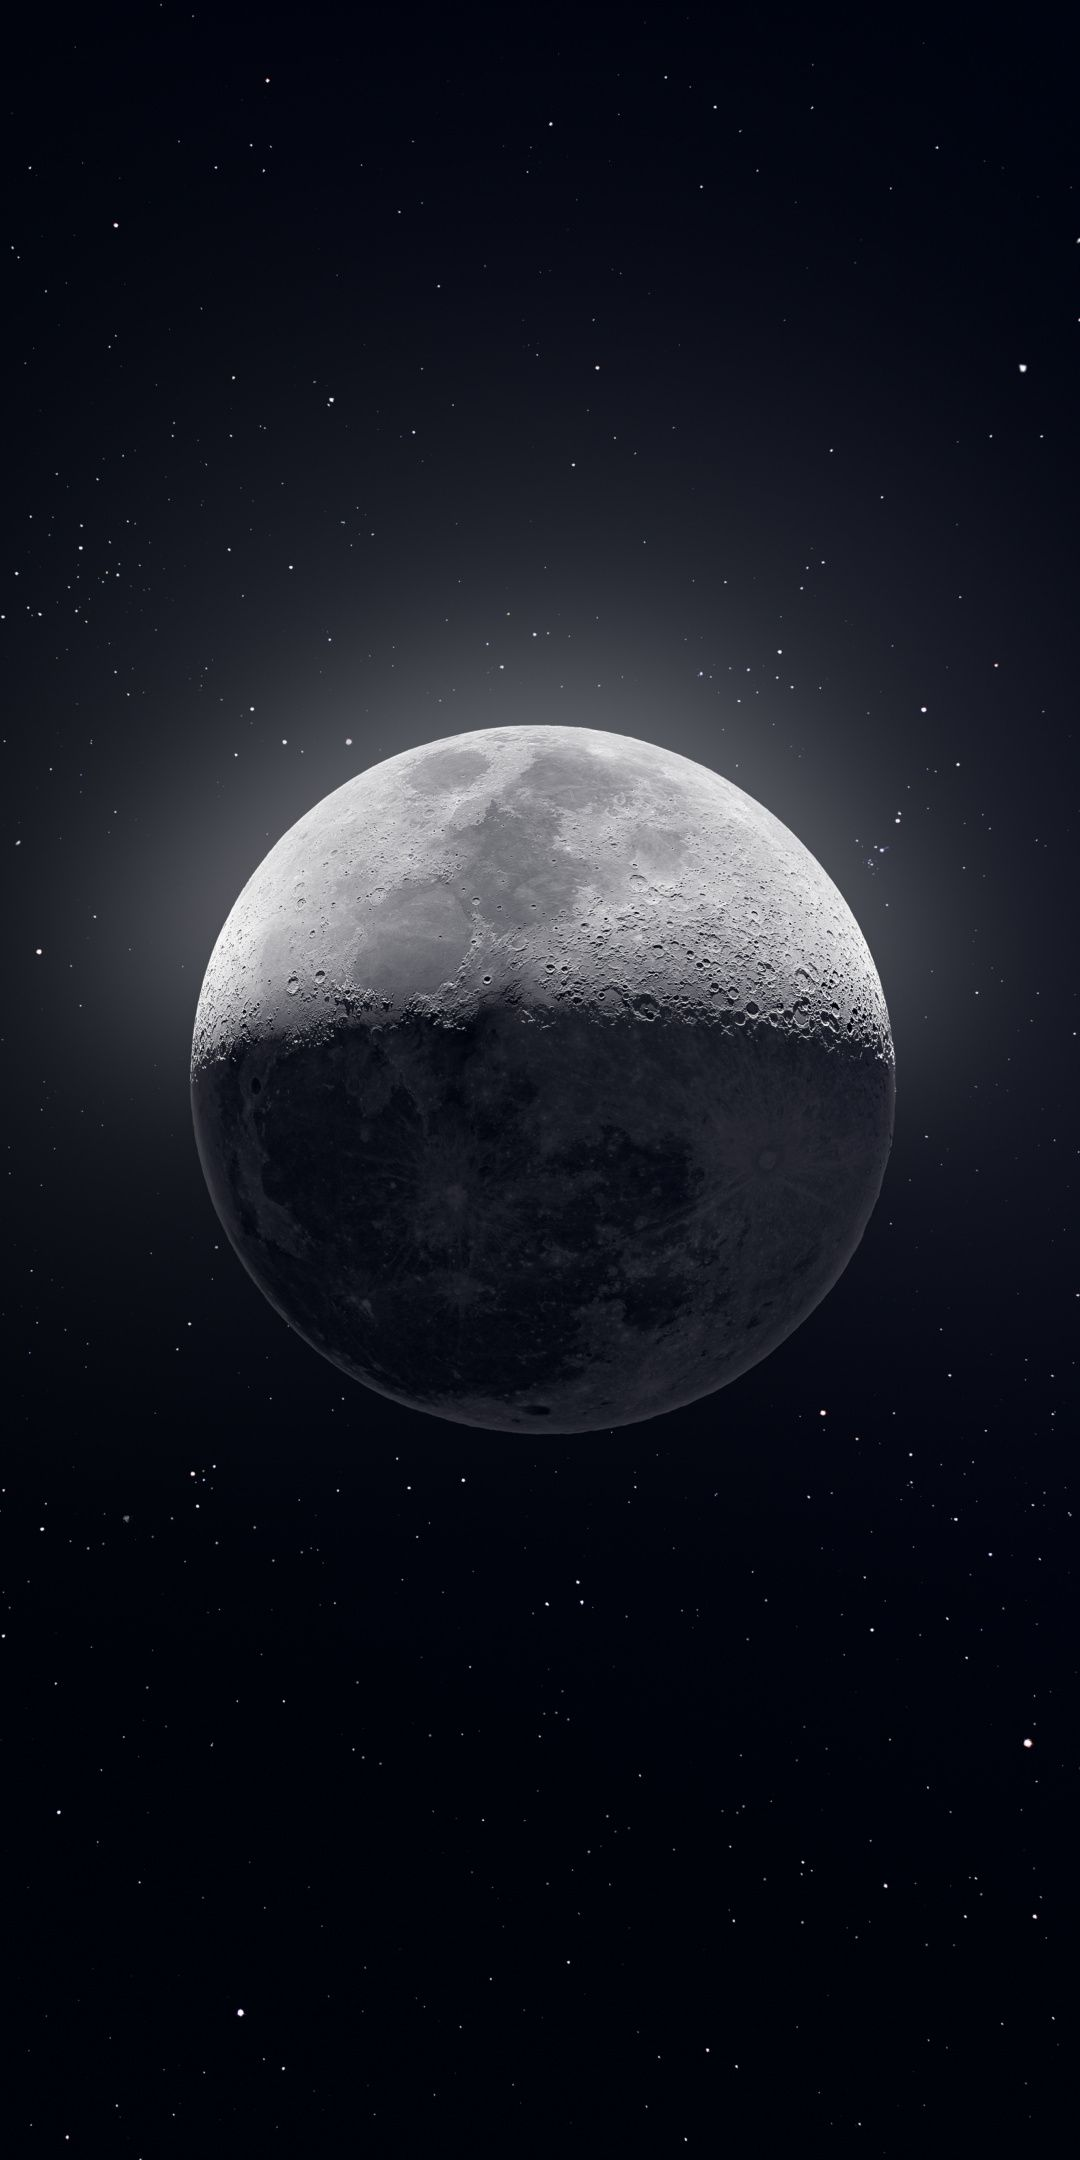 510+Moon, space, art, 21x21 wallpaper   Wallpaper earth, Iphone ...